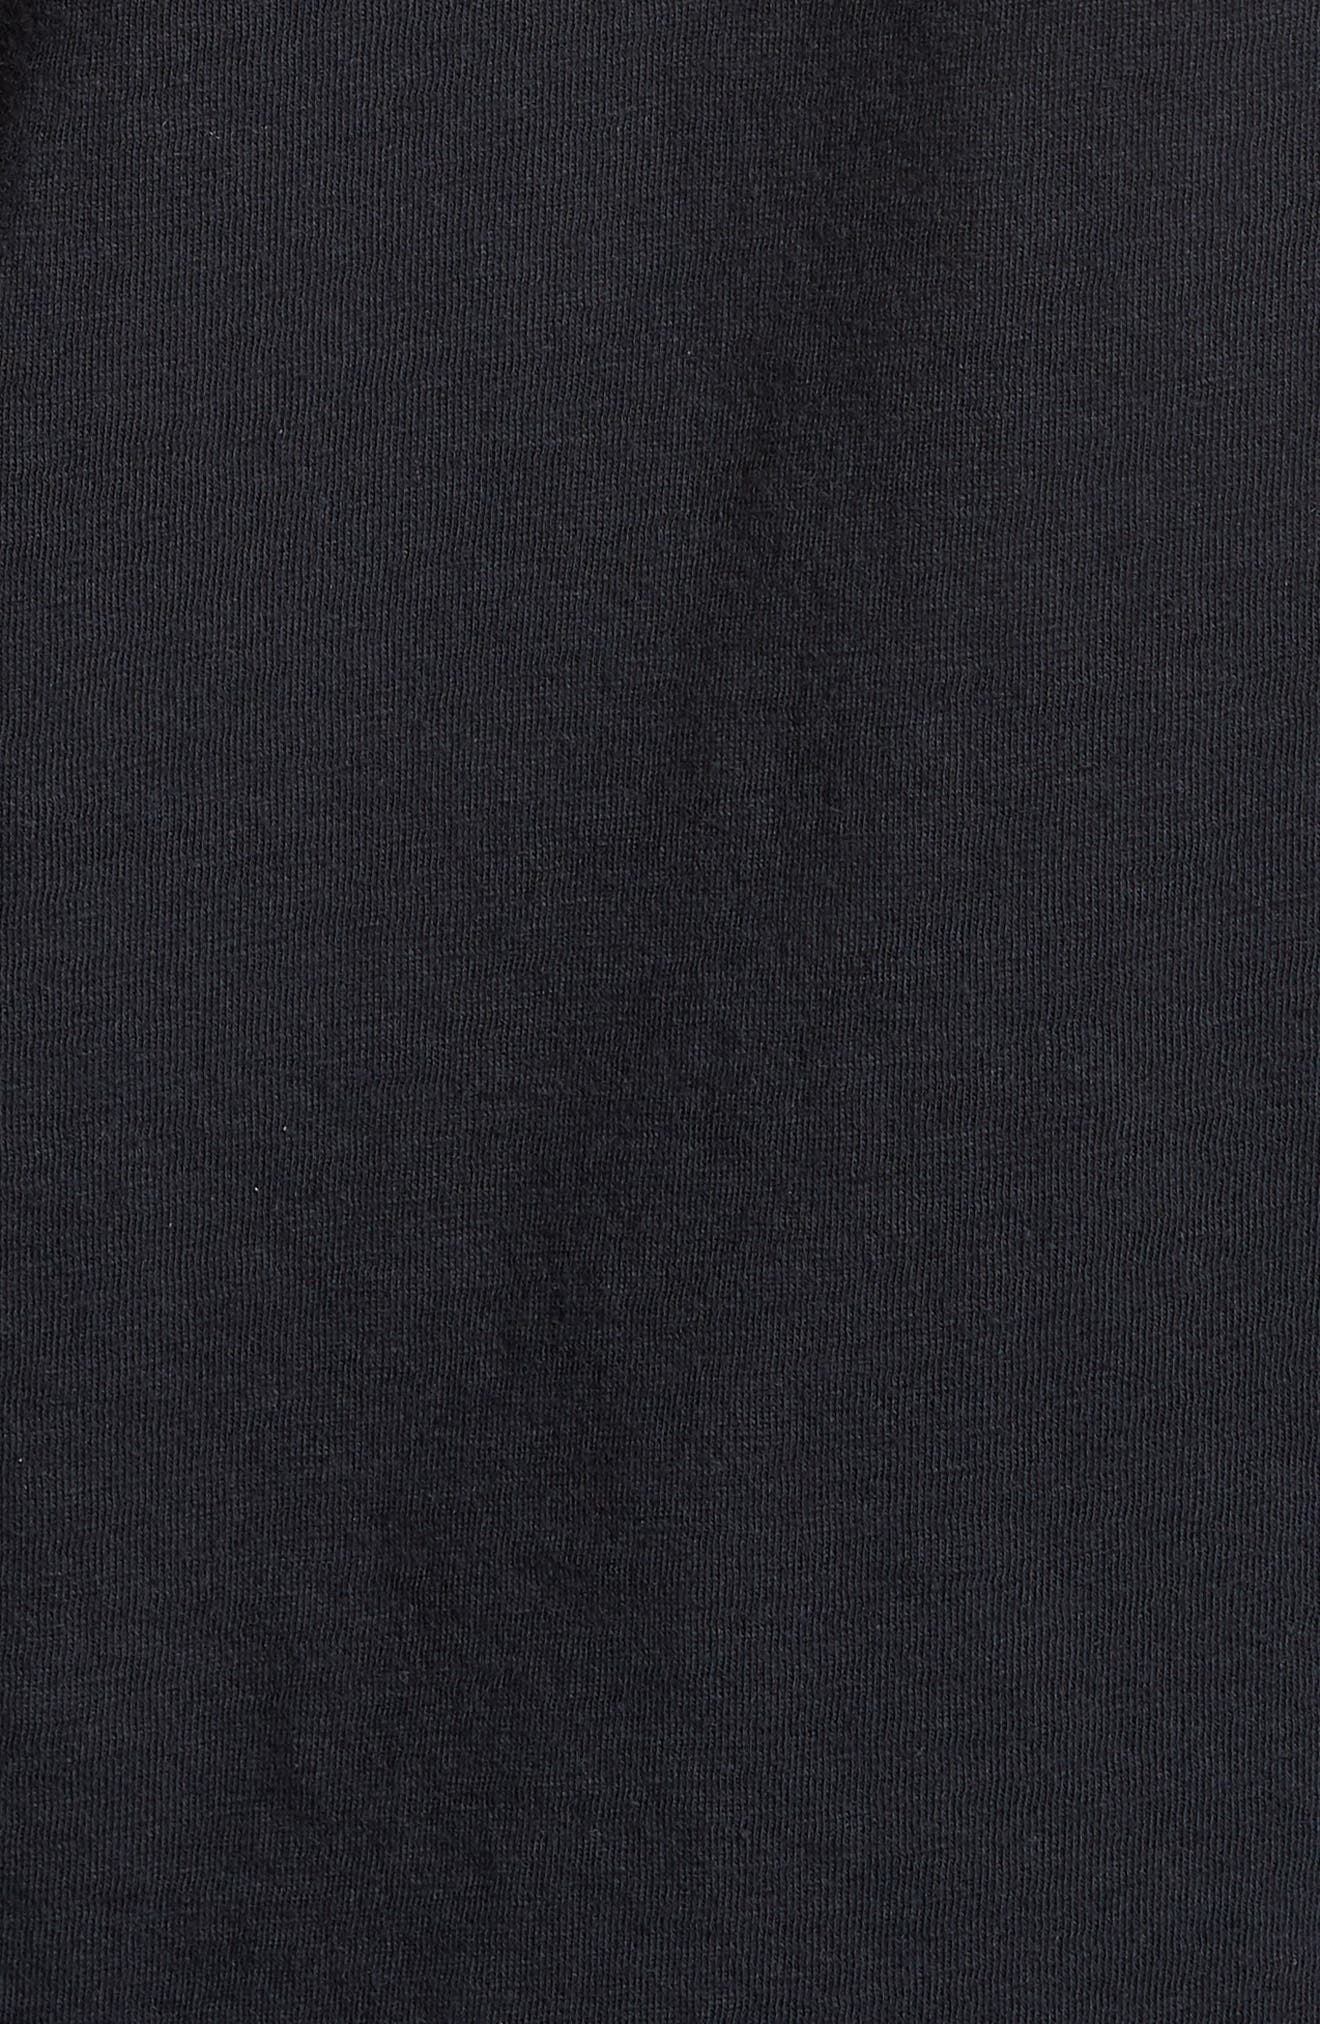 The Rolling Stones Trim Fit T-Shirt,                             Alternate thumbnail 5, color,